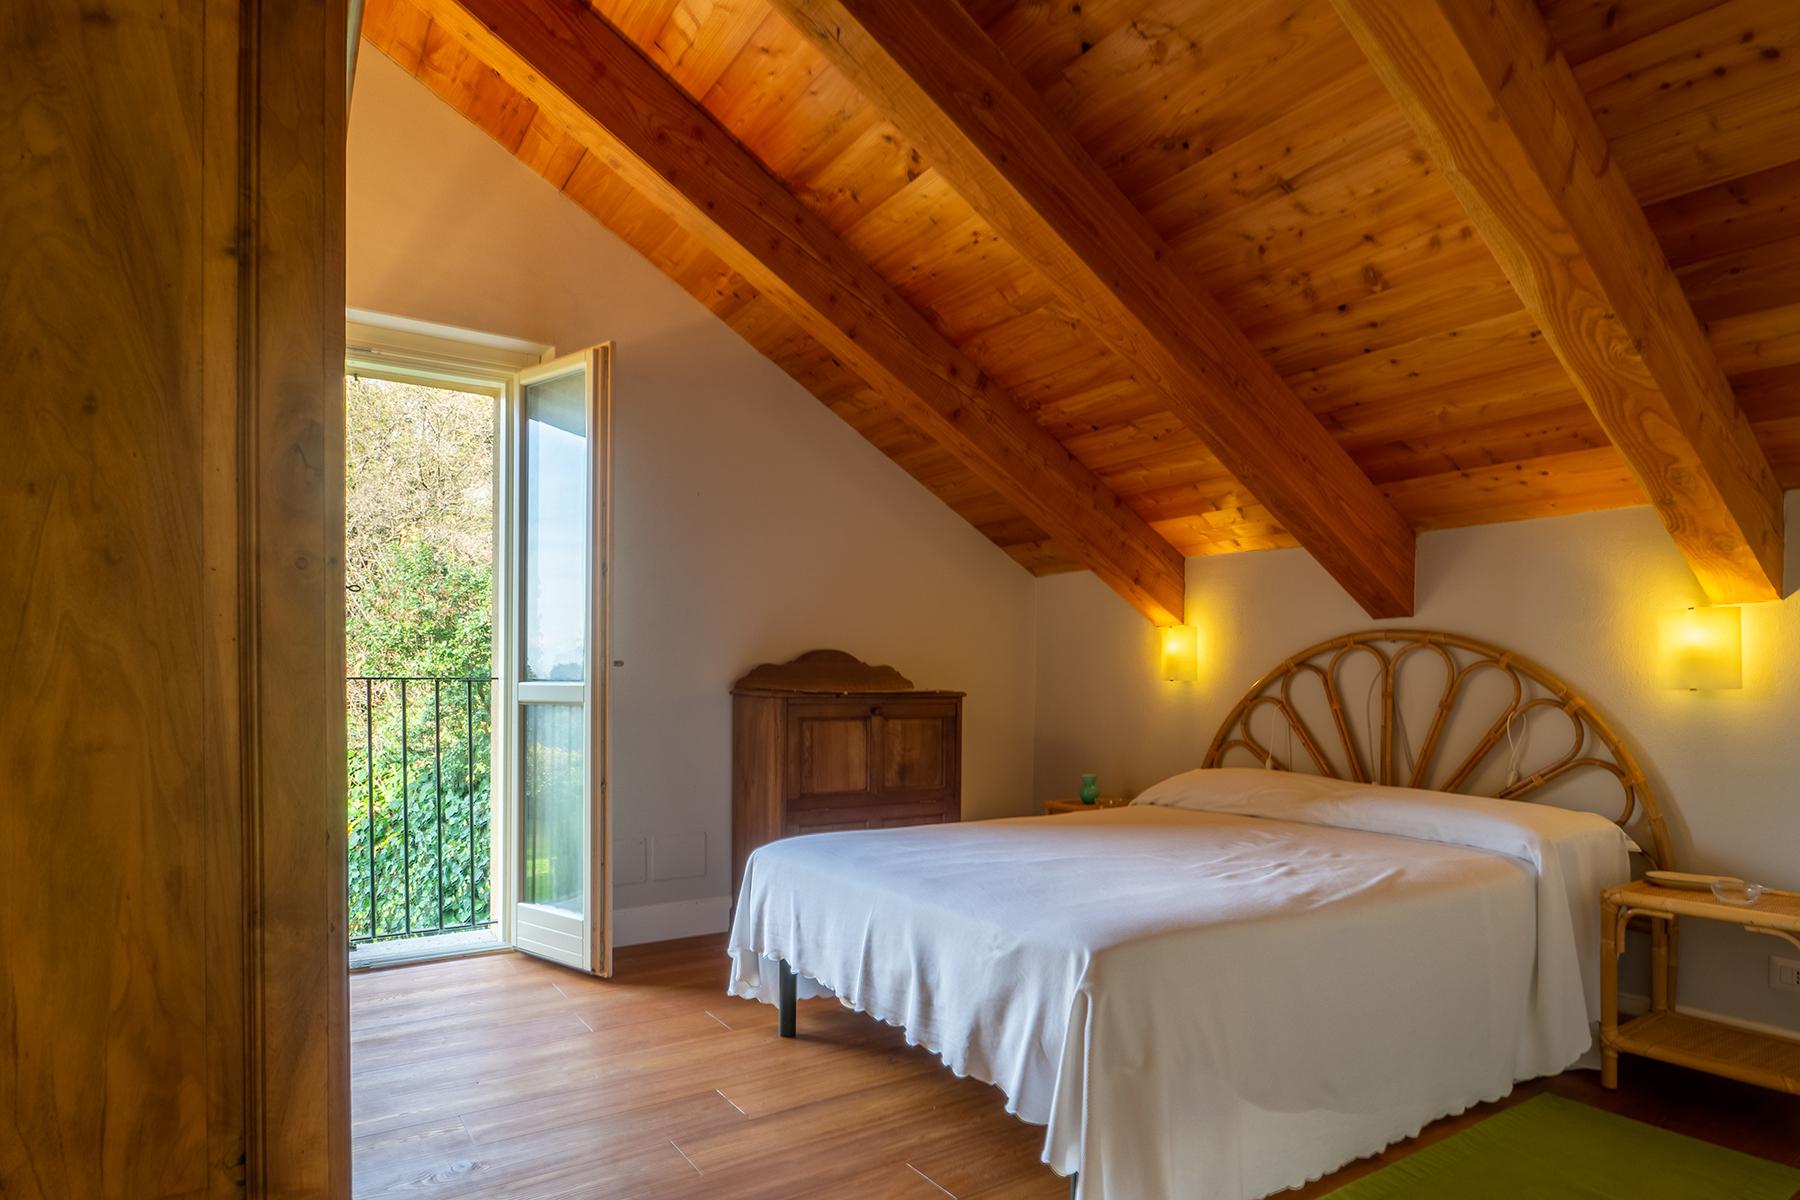 Casa indipendente in Vendita a Torino: 5 locali, 657 mq - Foto 28